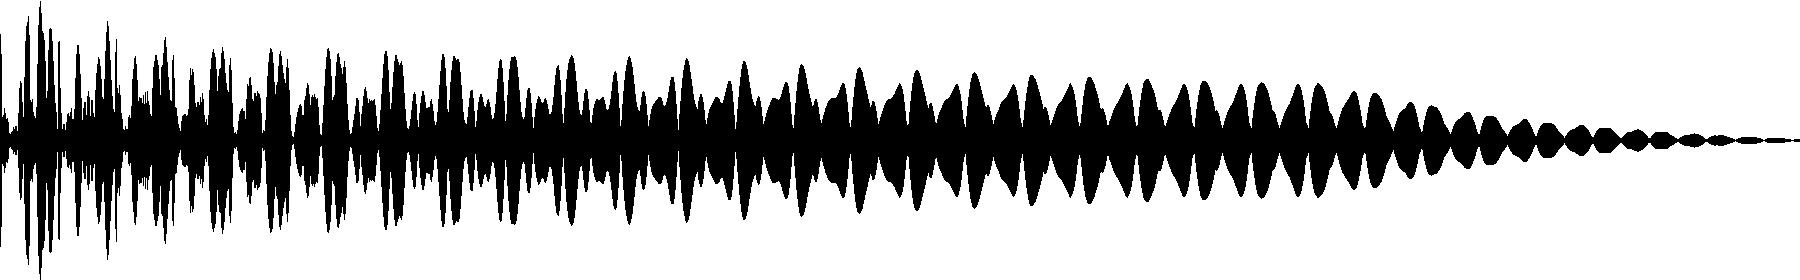 vedh bass cut 031 d